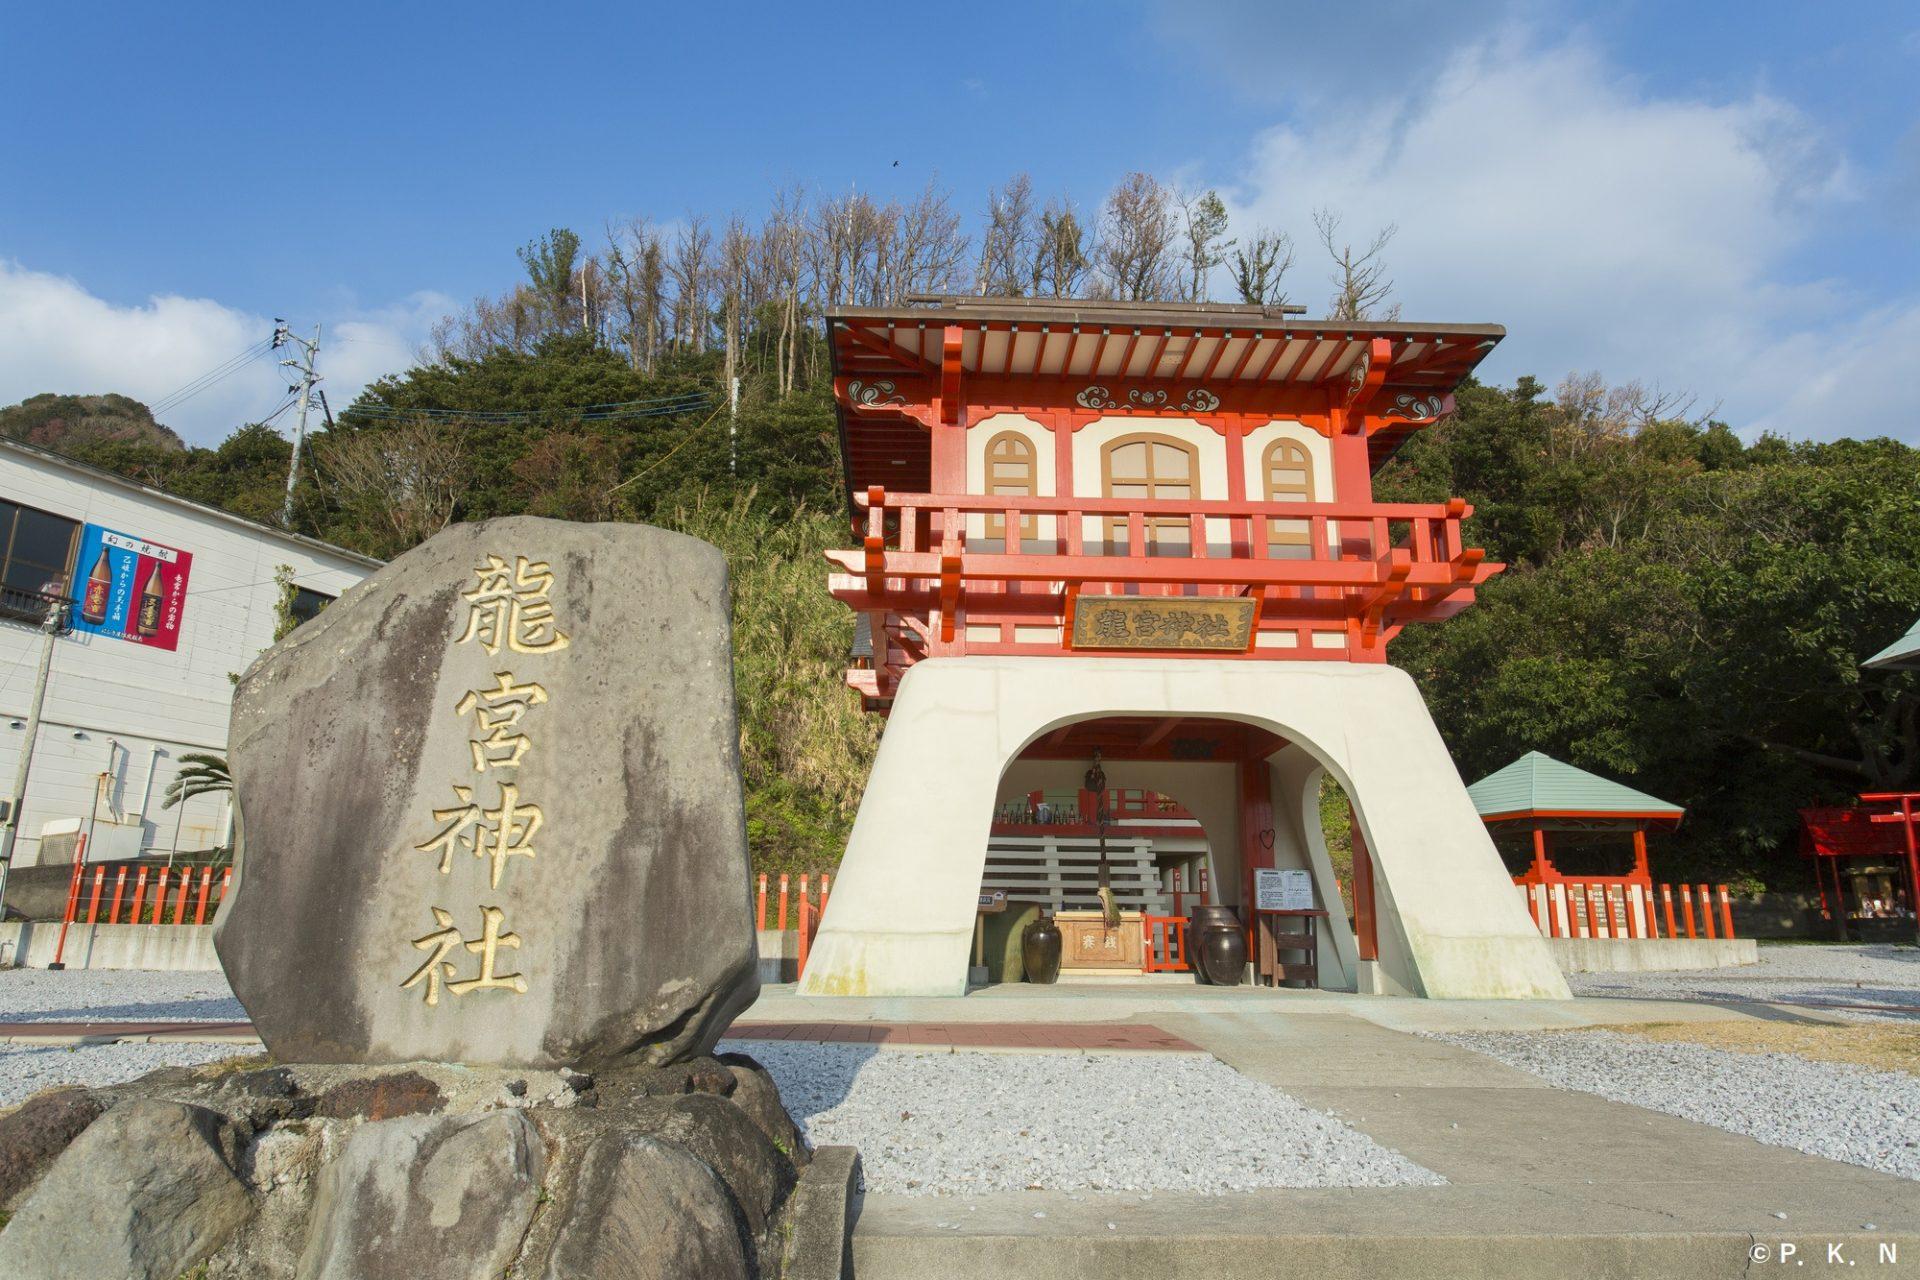 龍宮神社 指宿市 観光 地 スポット 鹿児島県 旅行 九州